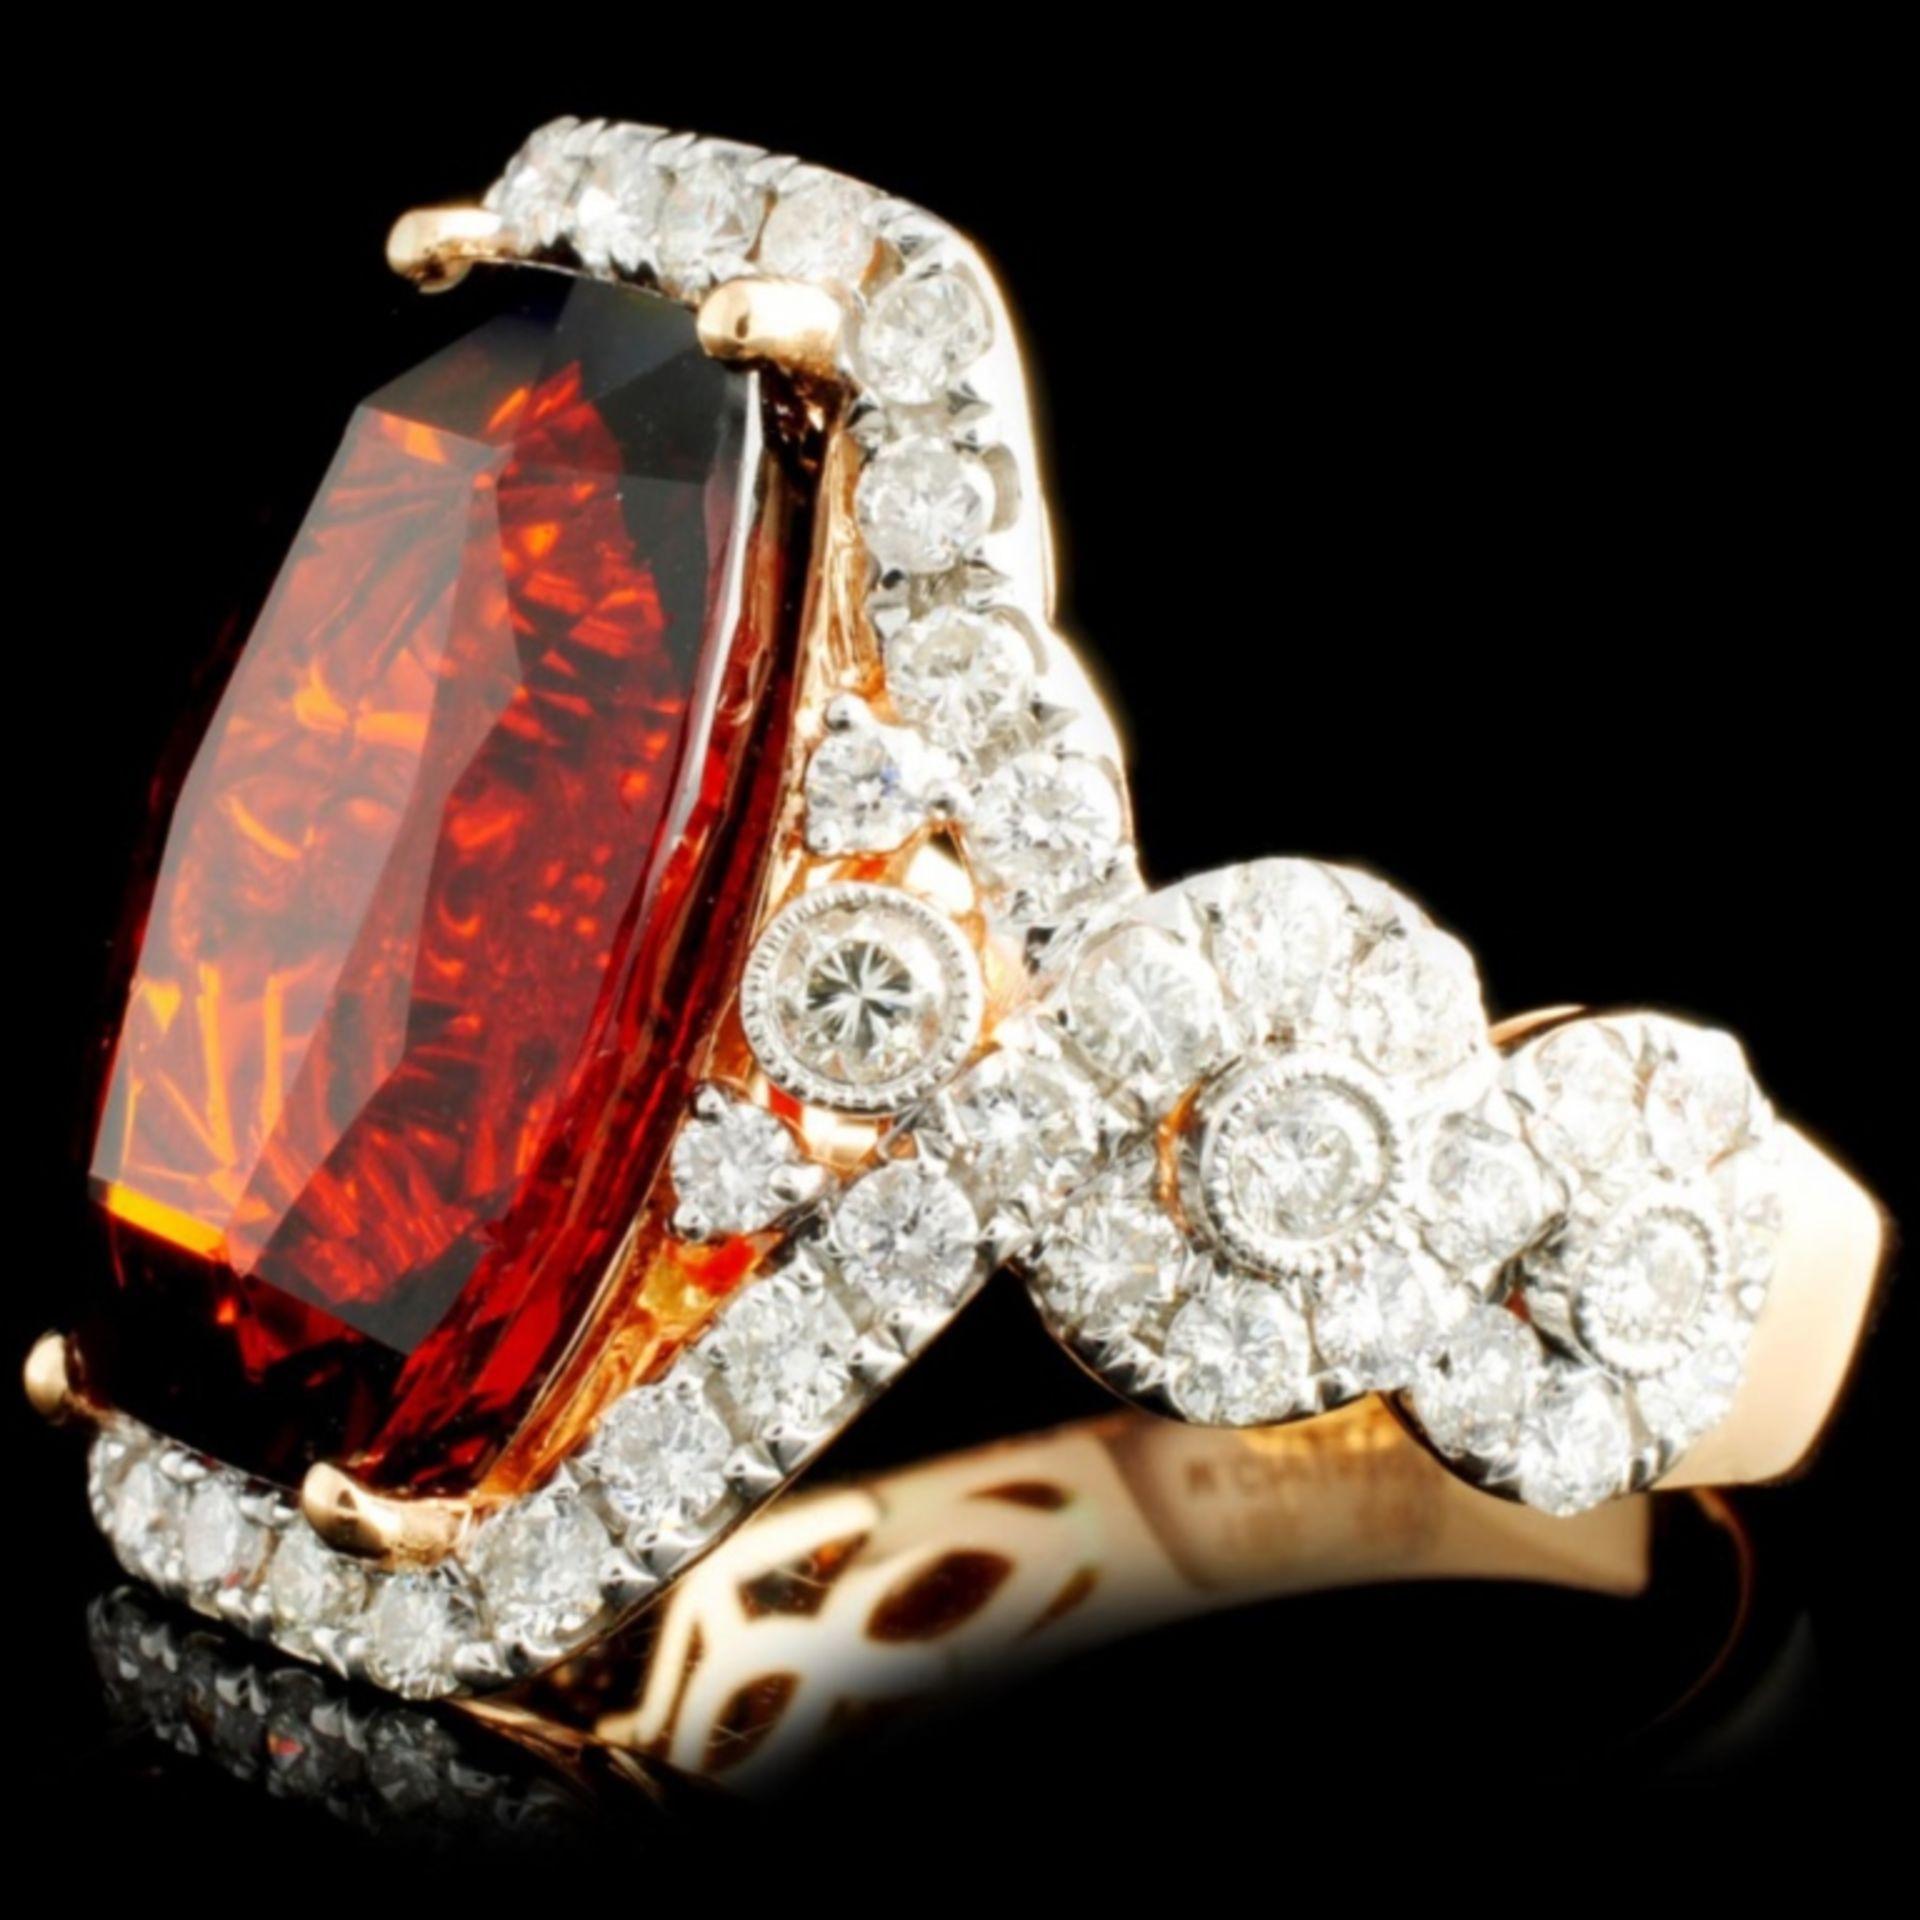 18K Gold 16.46ct Garnet & 1.81ctw Diamond Ring - Image 2 of 5